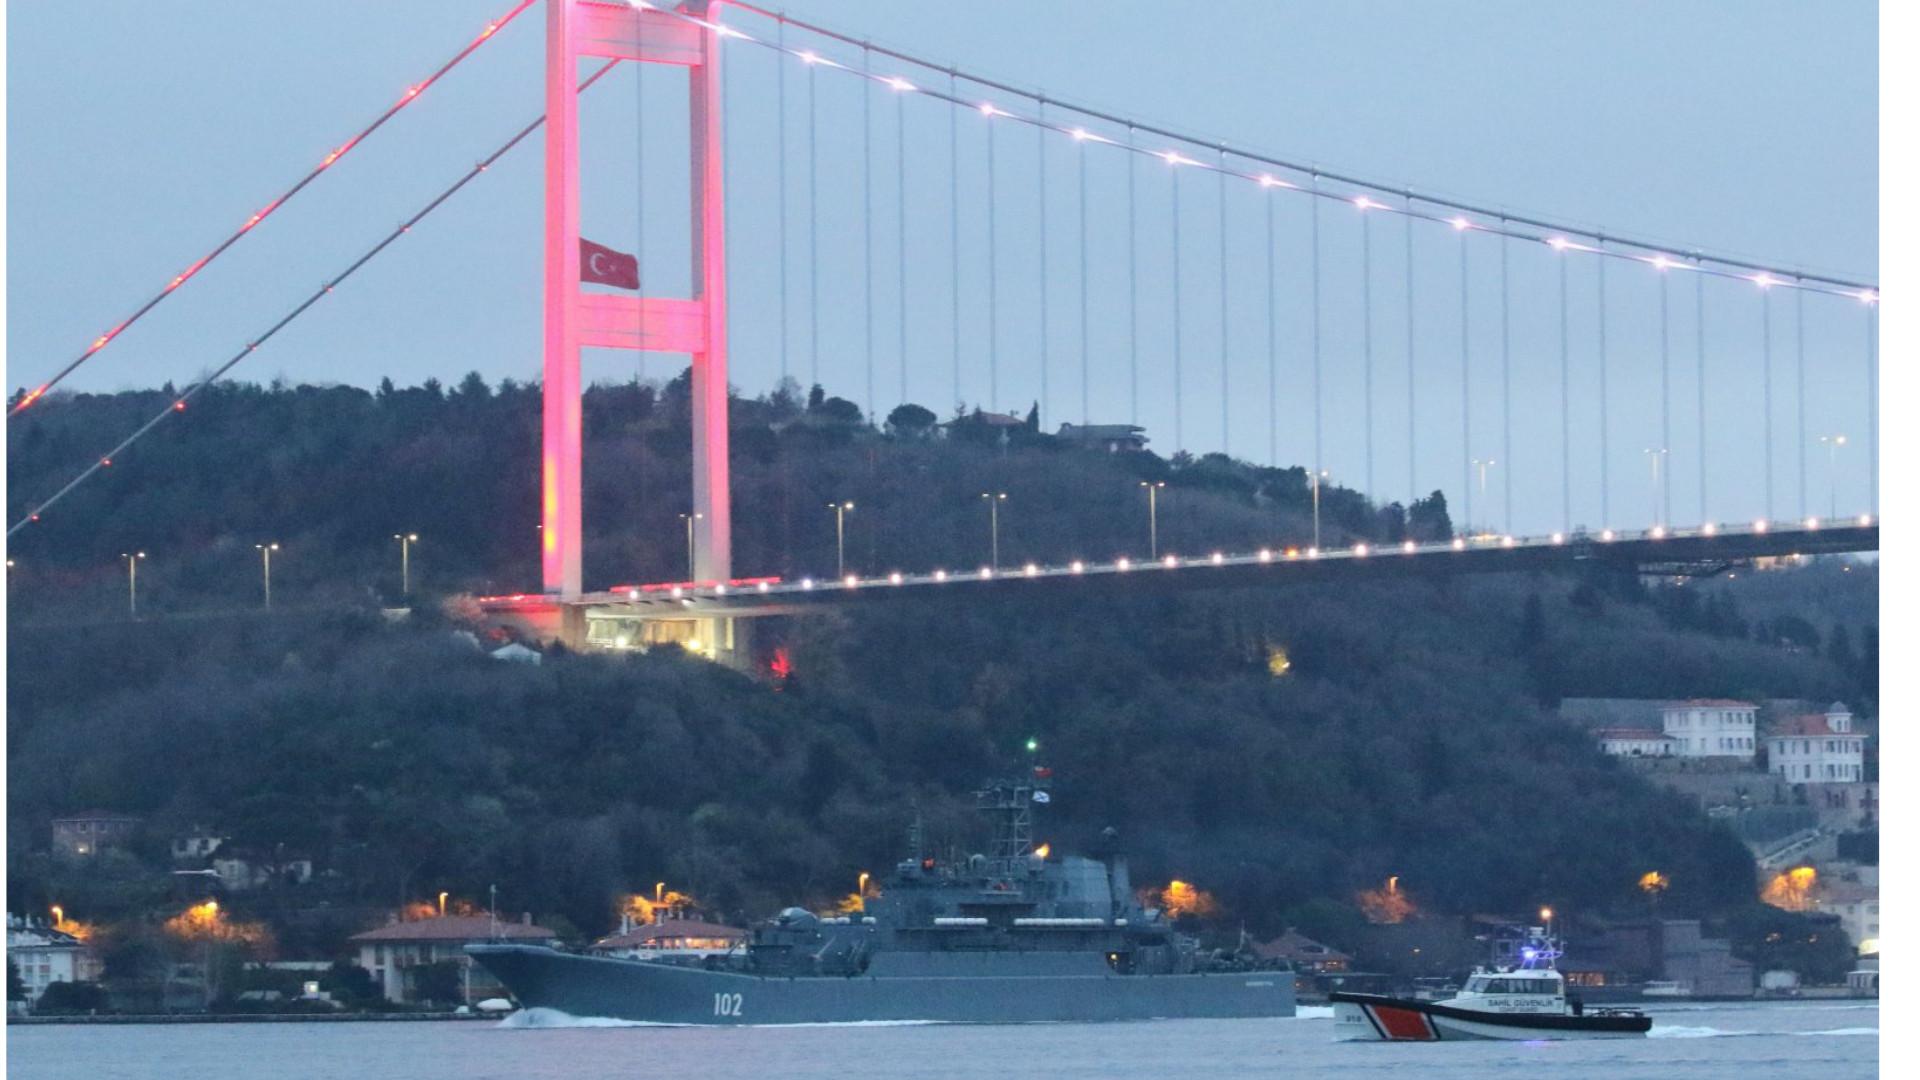 Turkey's Ukraine policy swept away by cold Black Sea wind